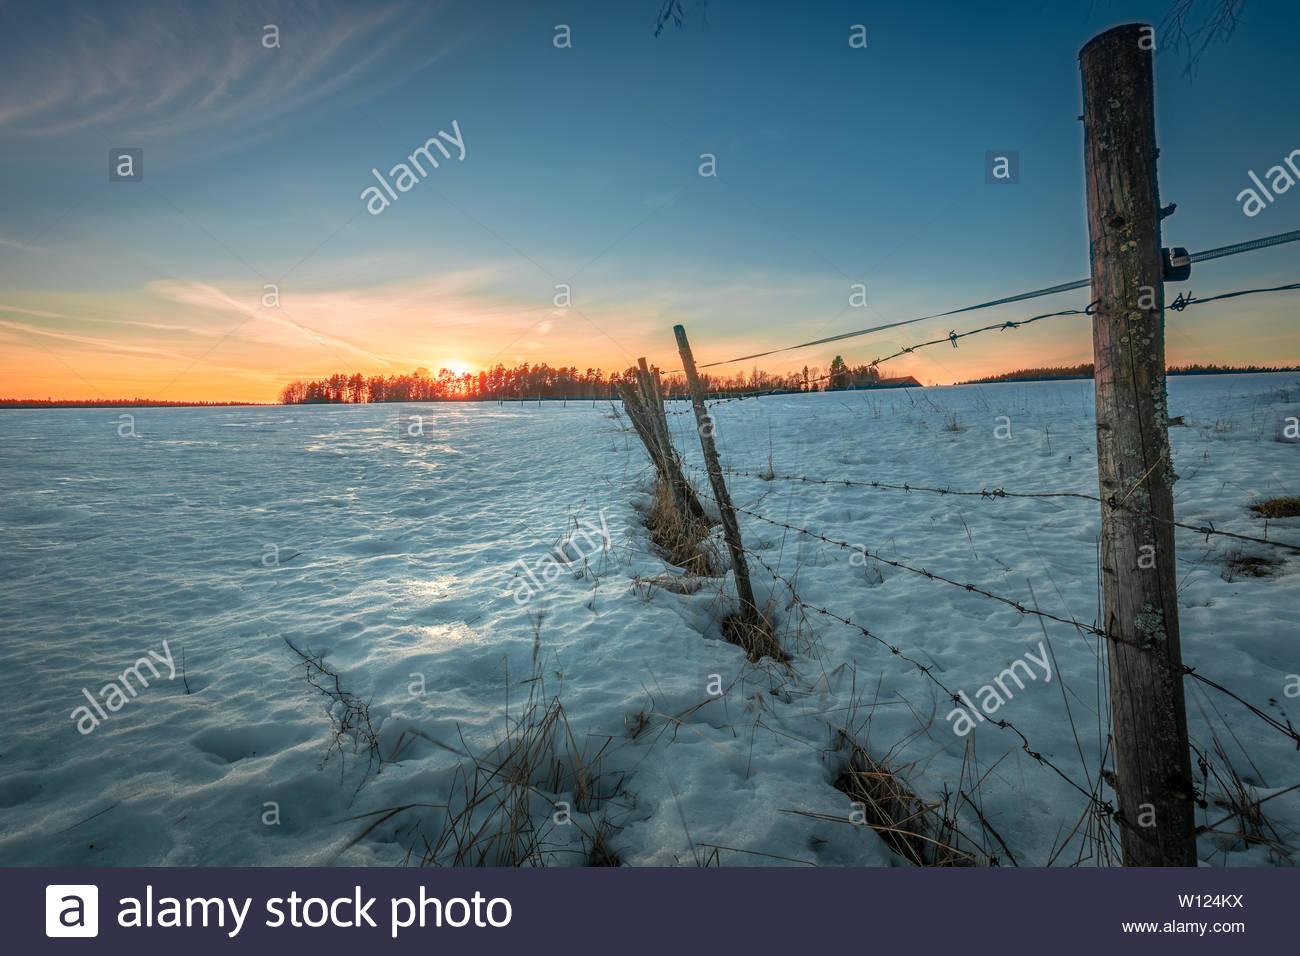 Barb wire, winter landscape - Stock Image